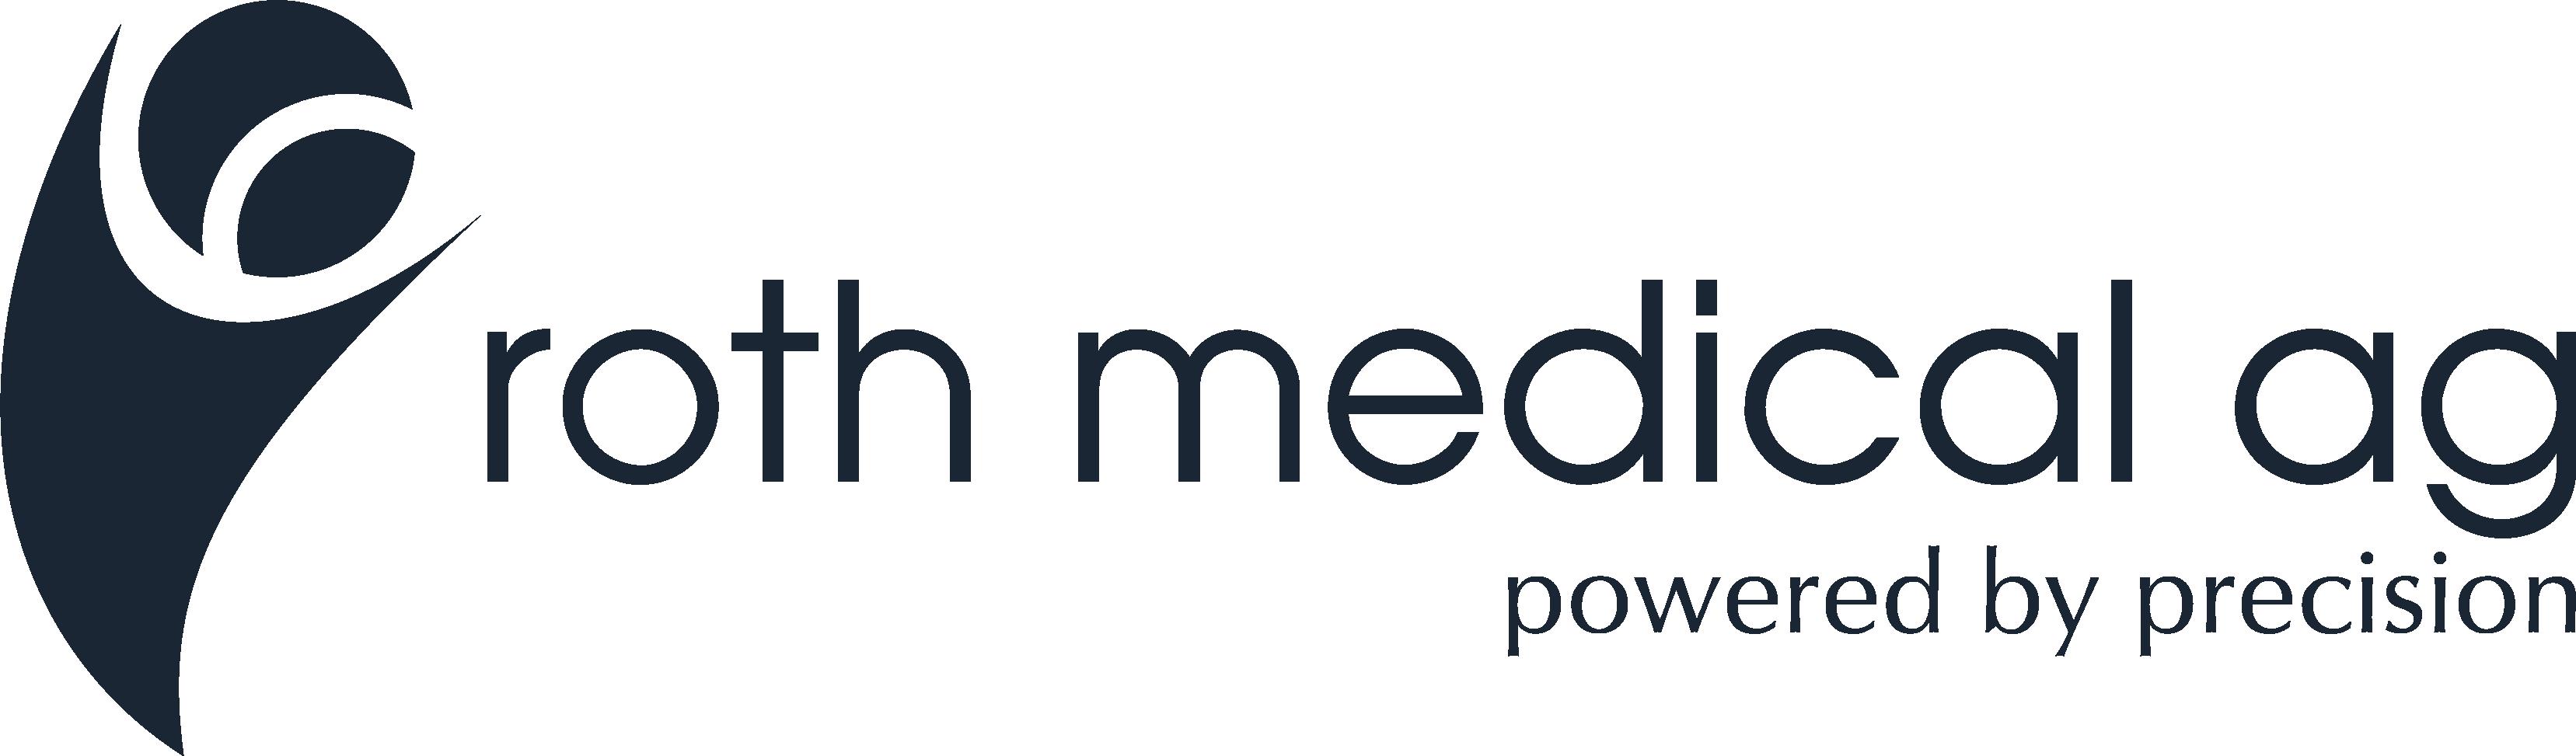 logo_roth_medical-positiv